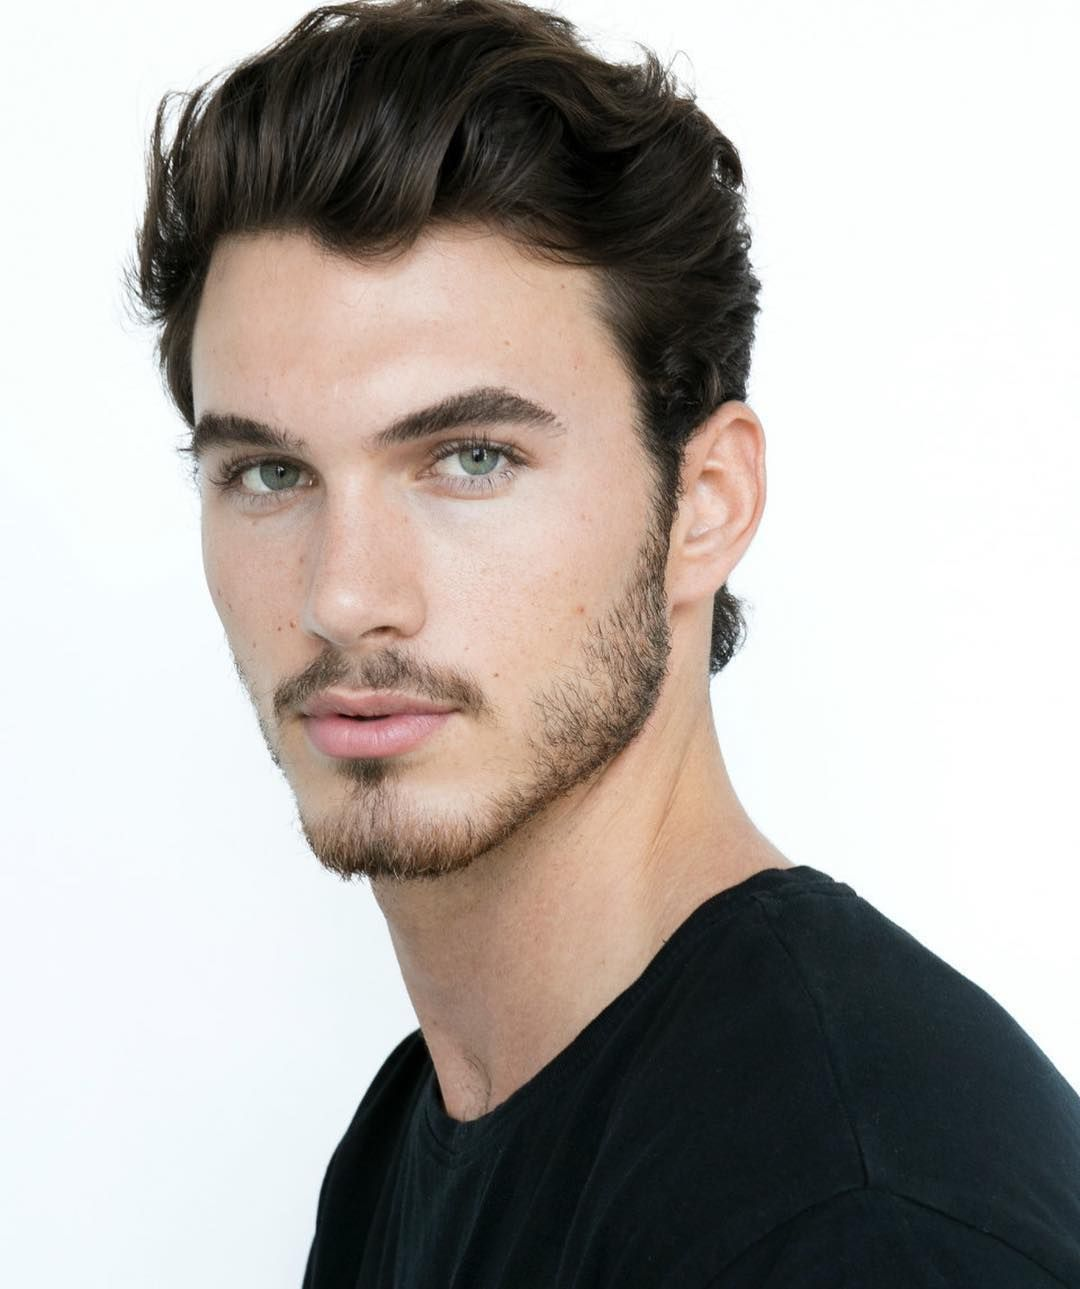 Loving Male Models Lmm On Instagram Michaelyerger Michael